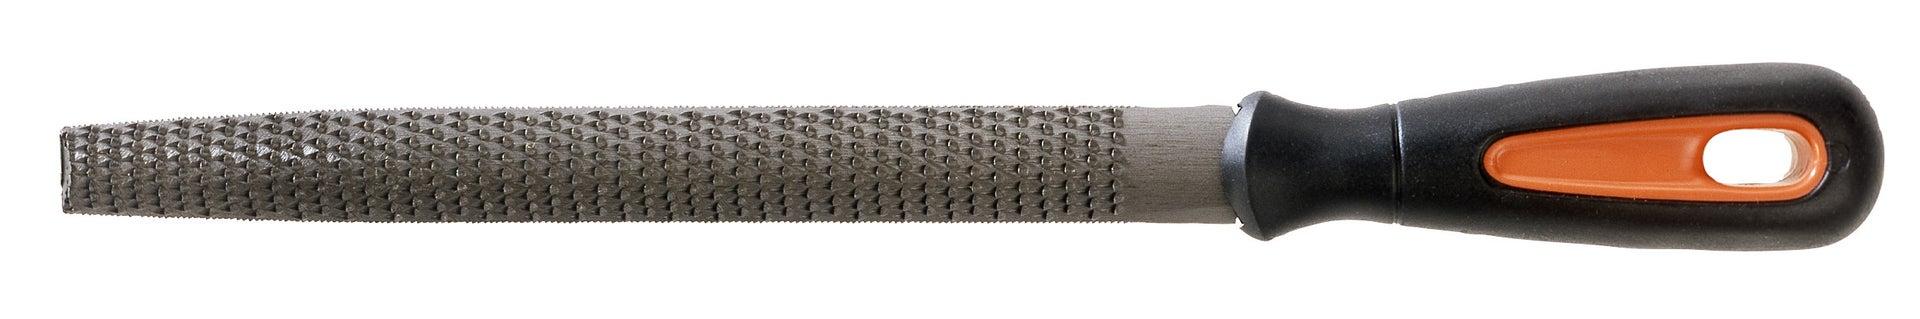 Râpe mi-ronde ou cabinette BAHCO, 200 mm